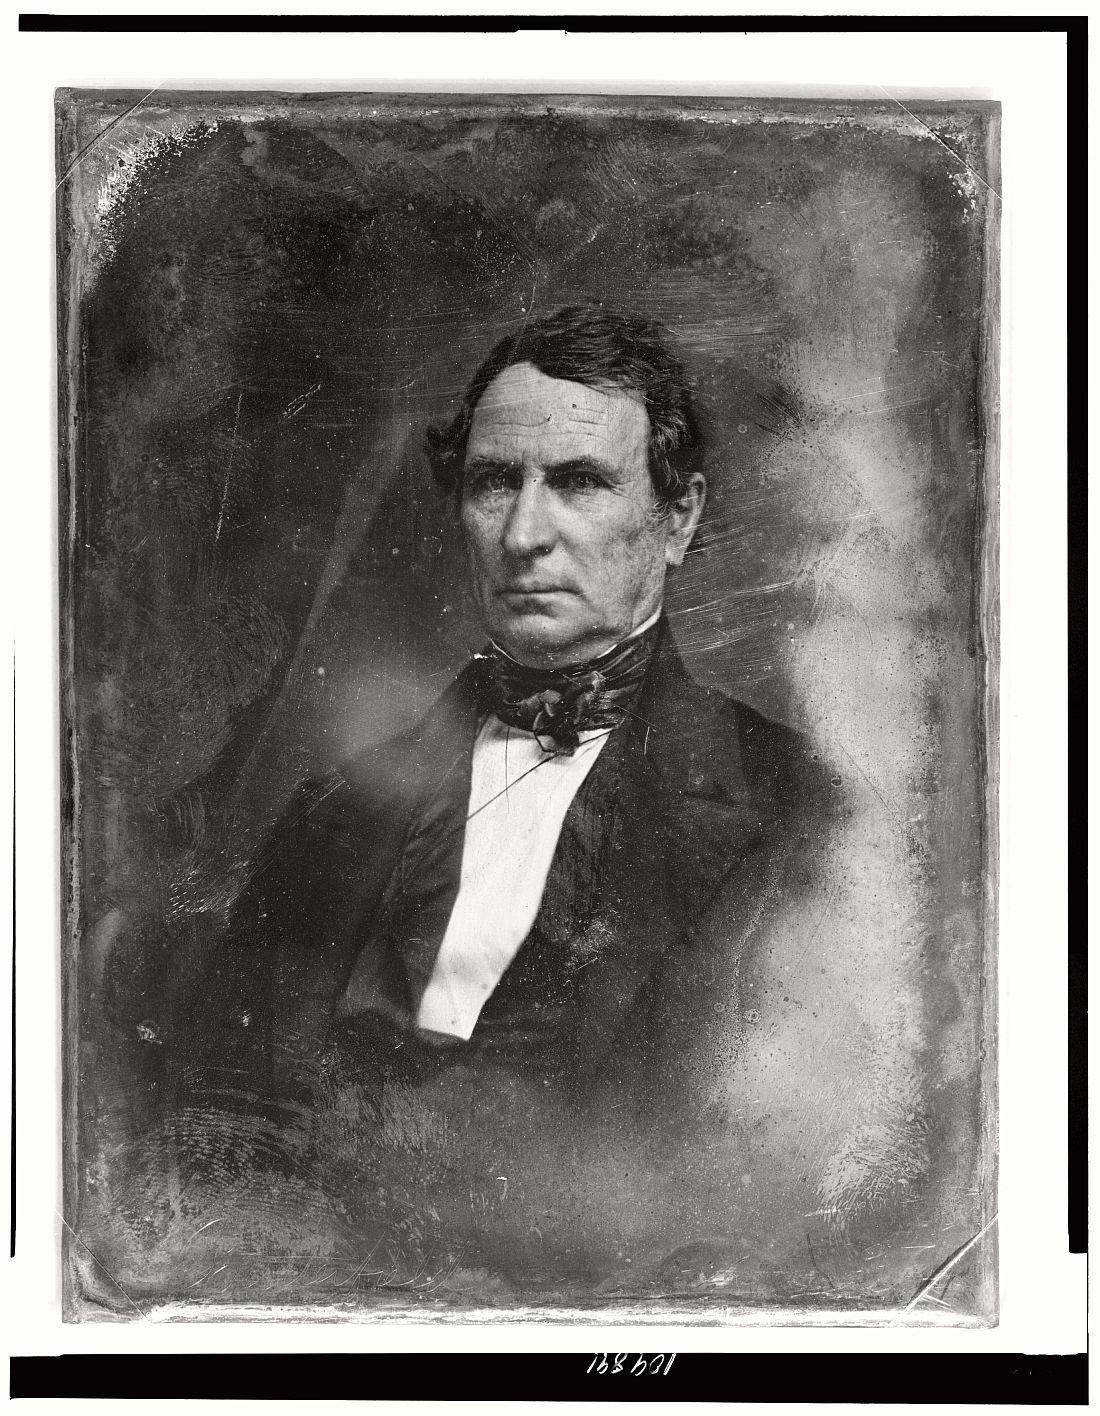 vintage-daguerreotype-portraits-from-xix-century-1844-1860-15